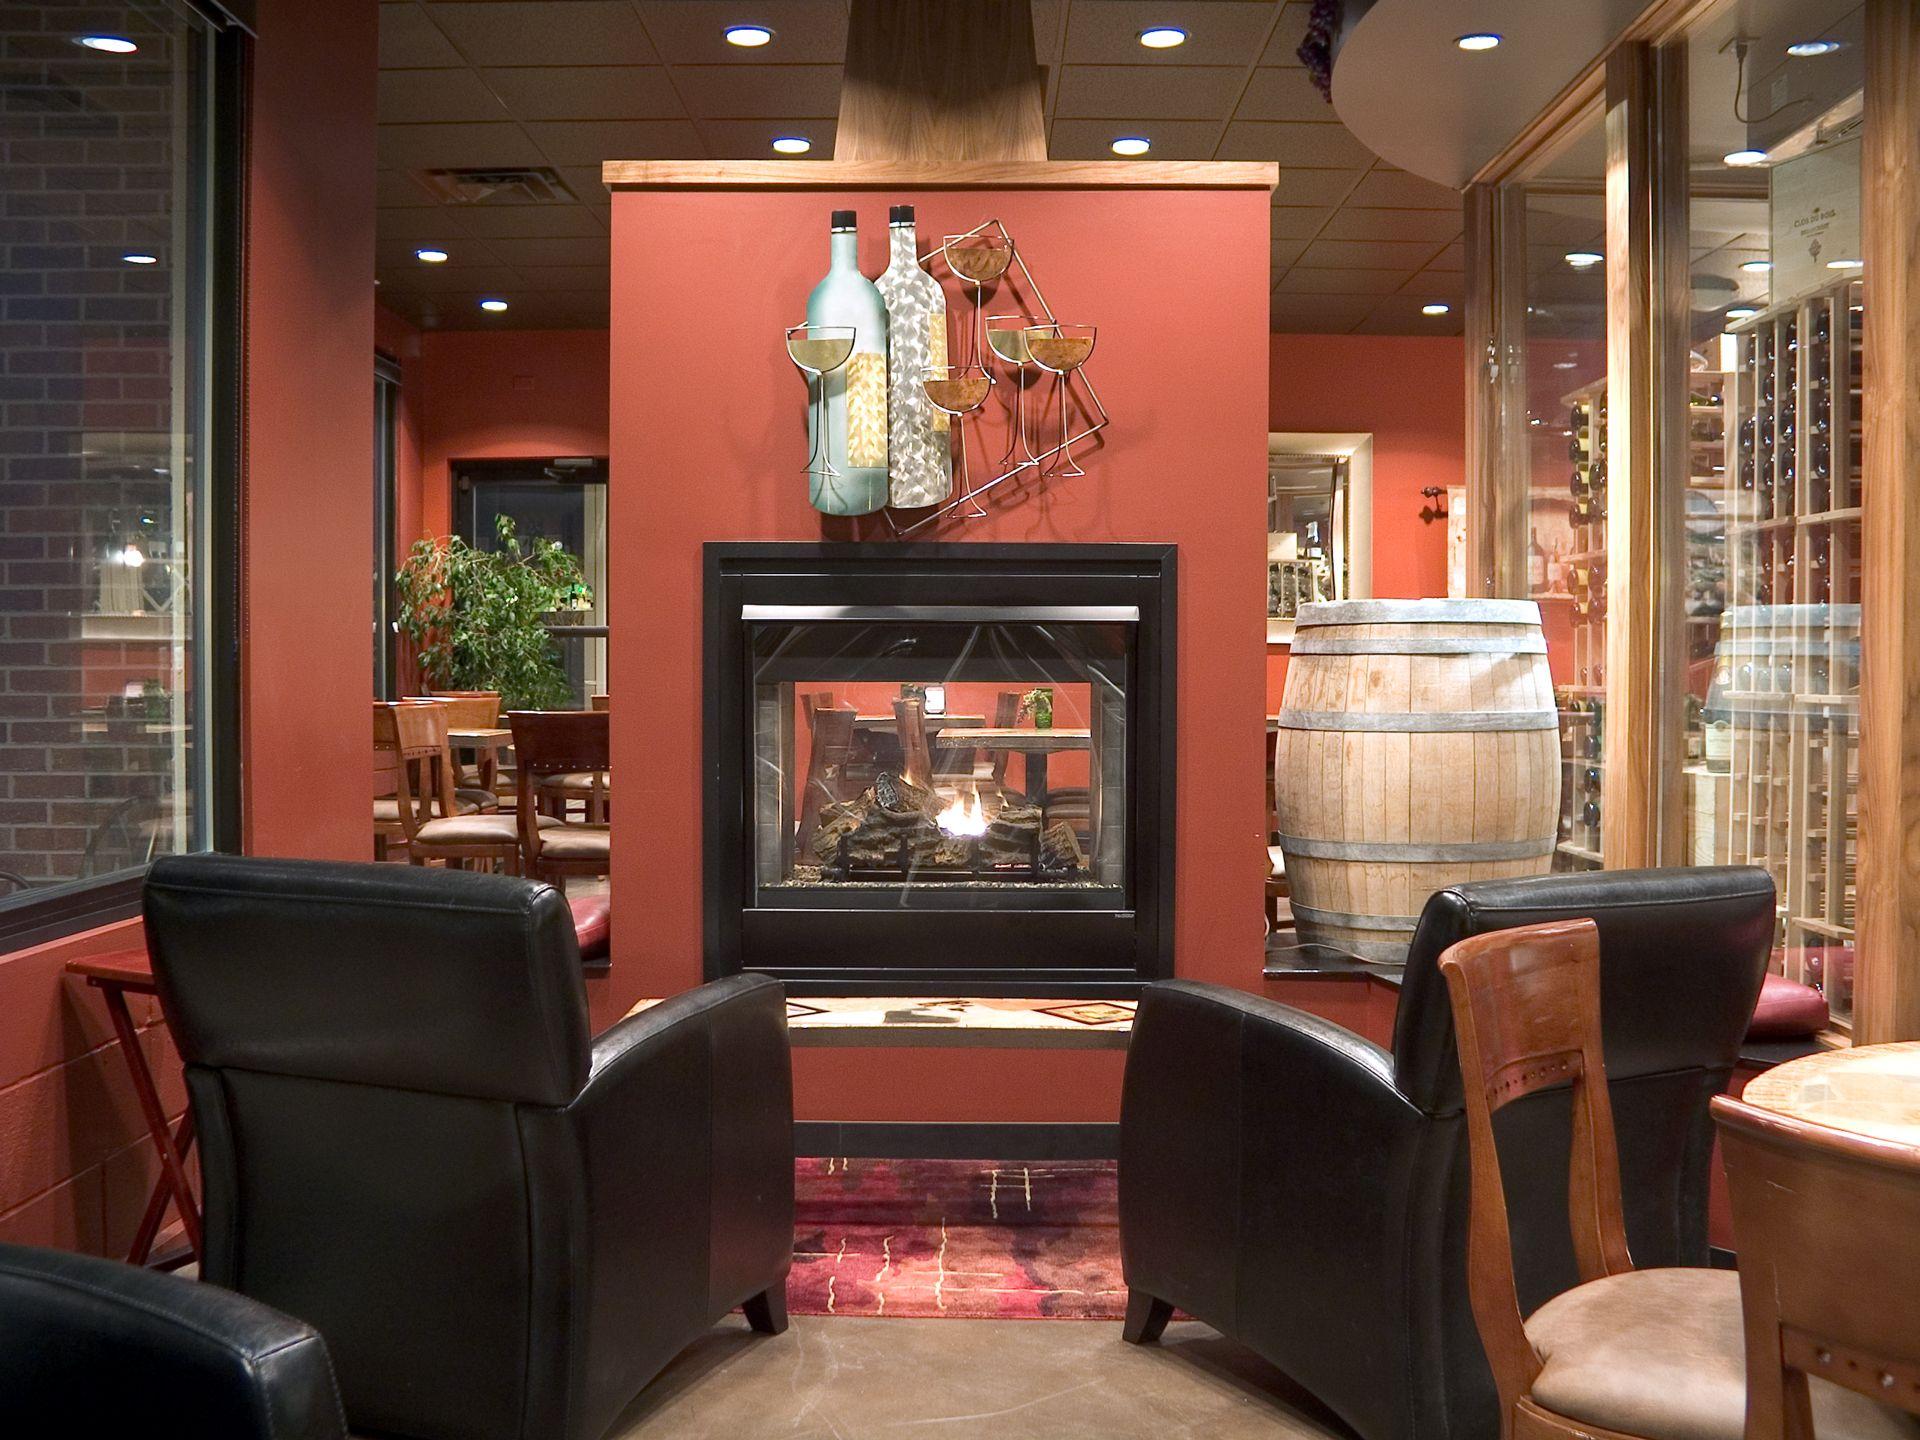 Vines Fireplace